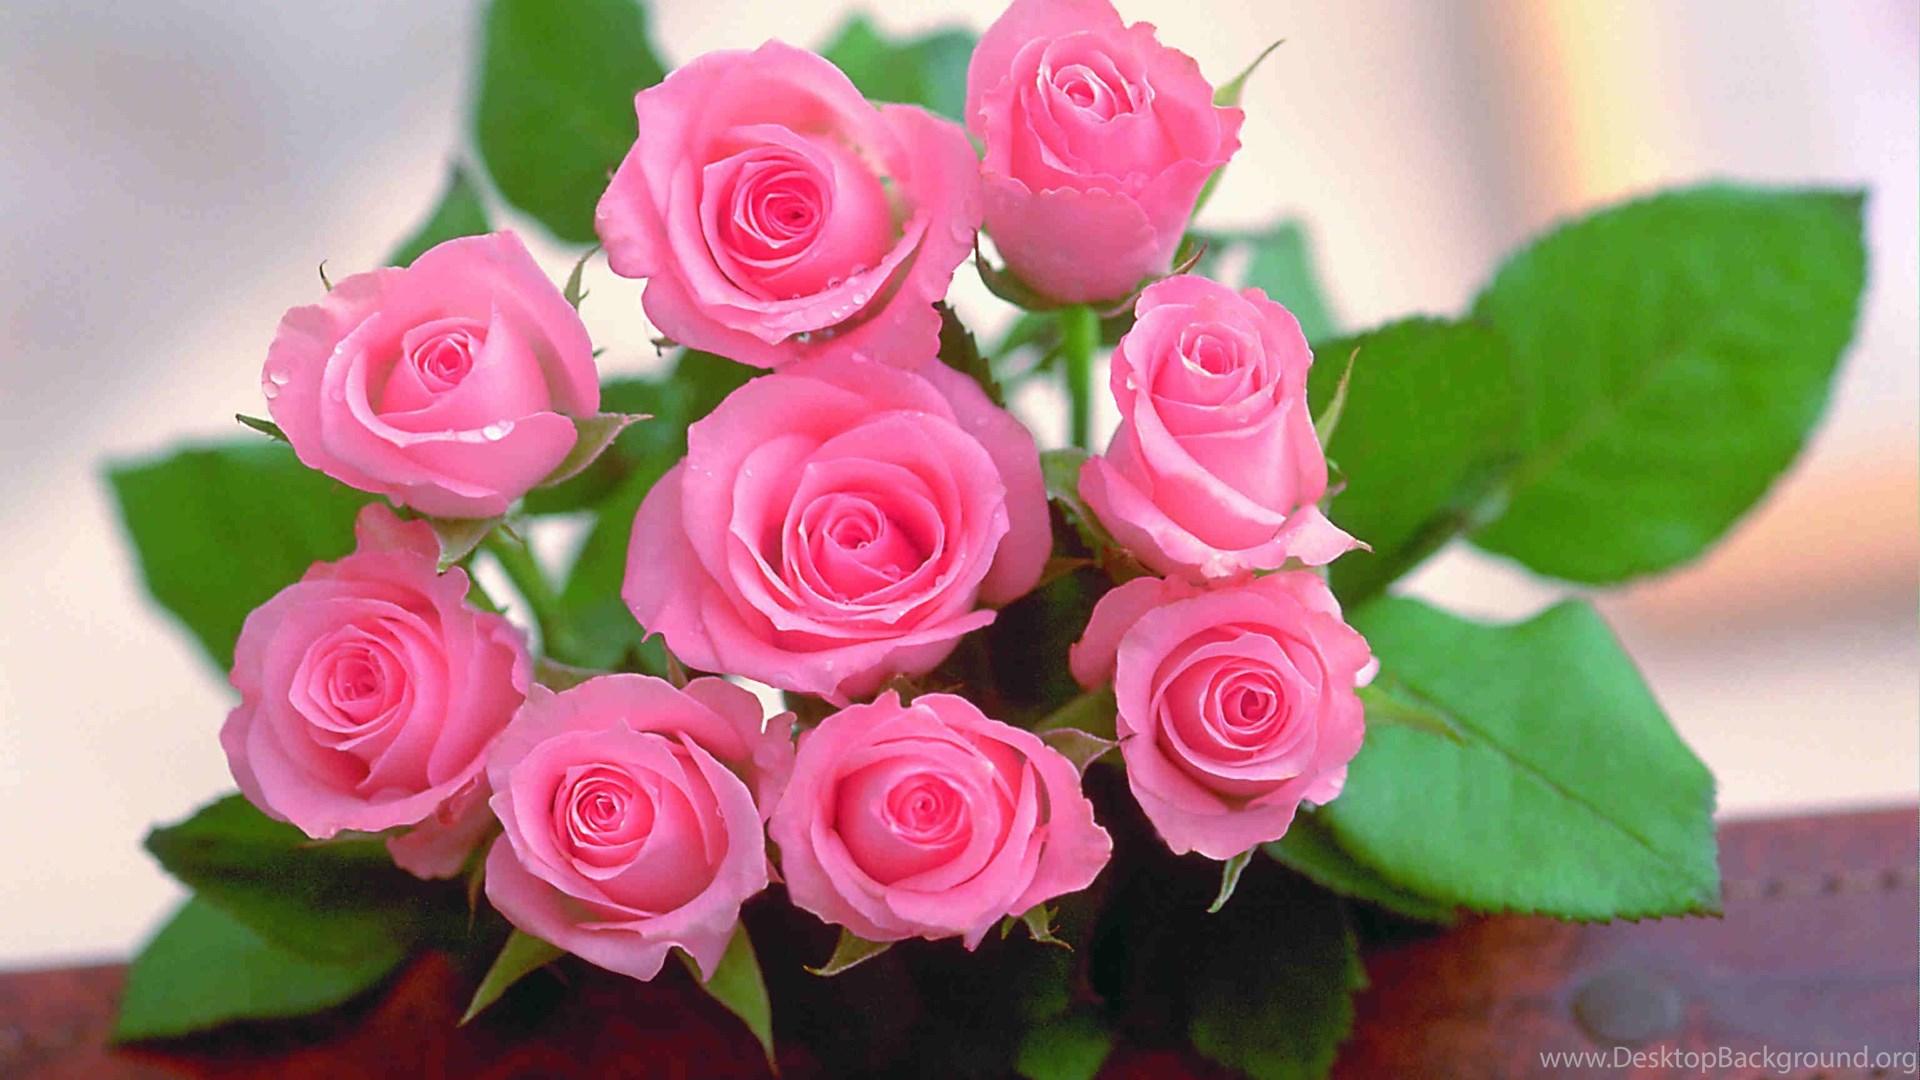 Download beautiful flowers hd wallpapers 1080p wallmanage popular izmirmasajfo